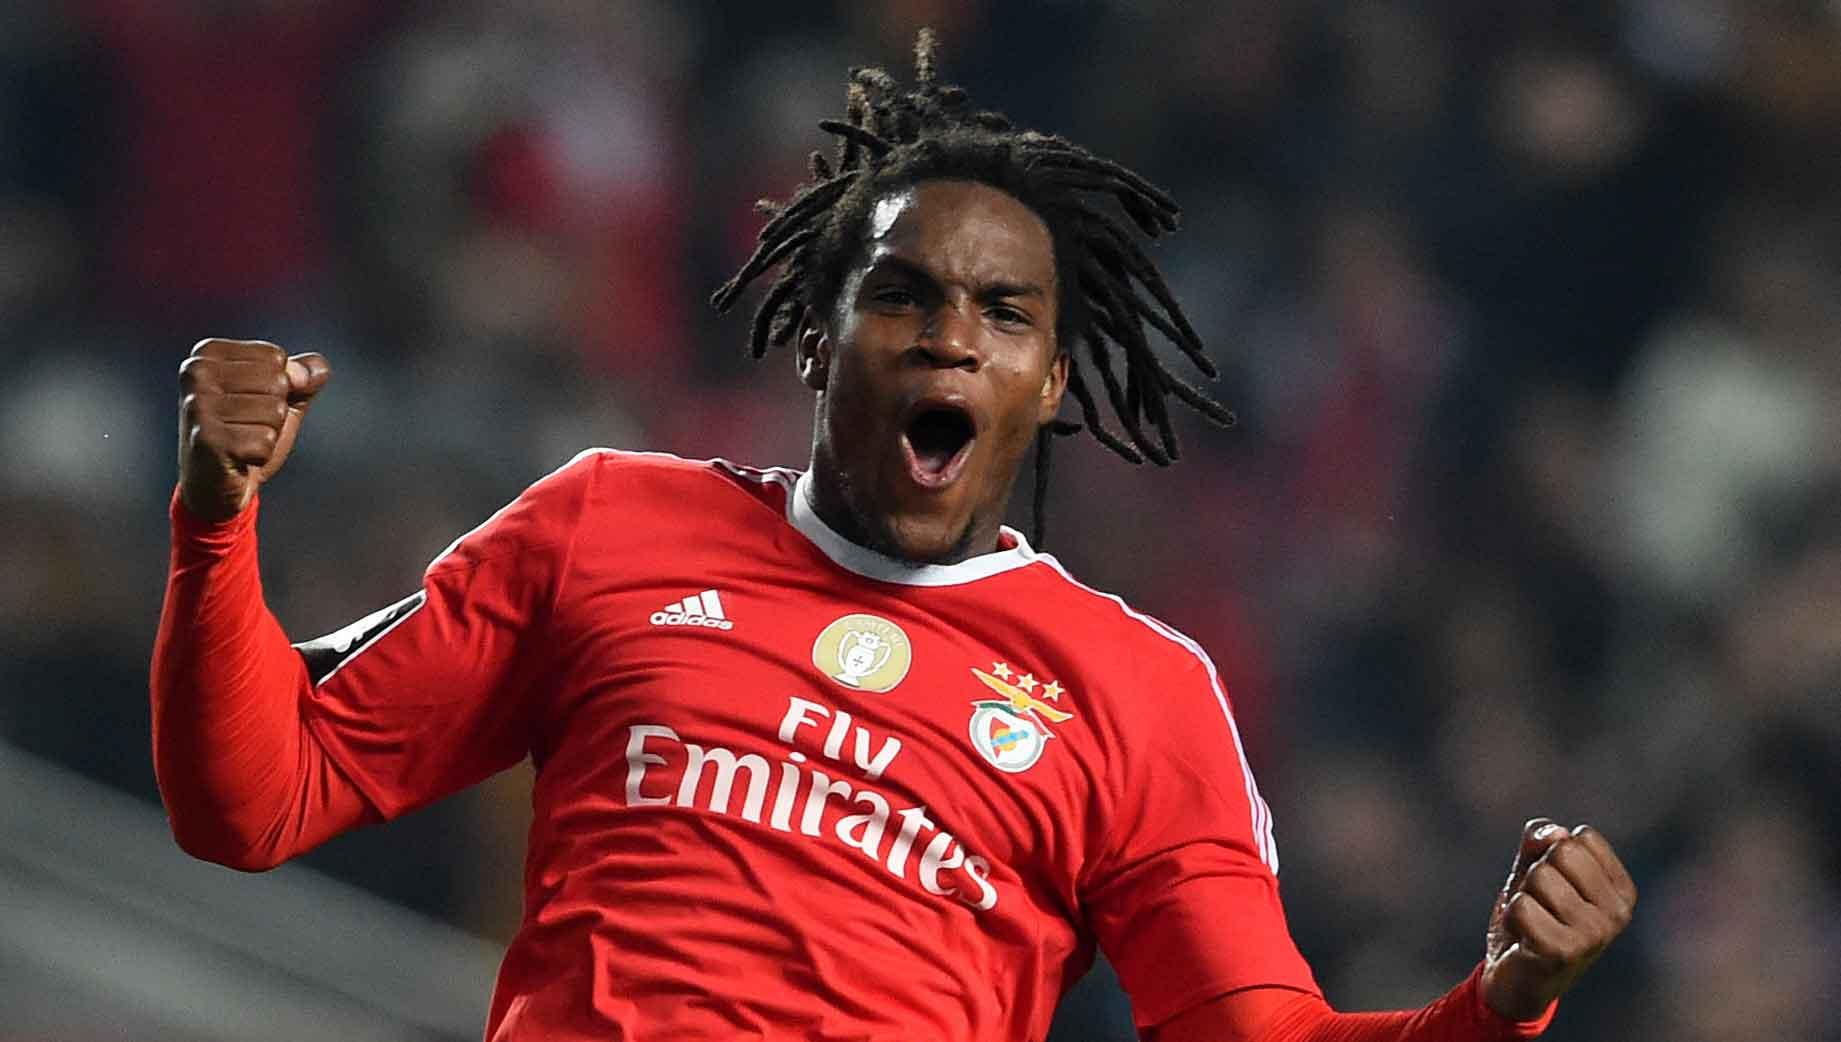 Bayern Munich signed Benfica starlet Renato Sanches